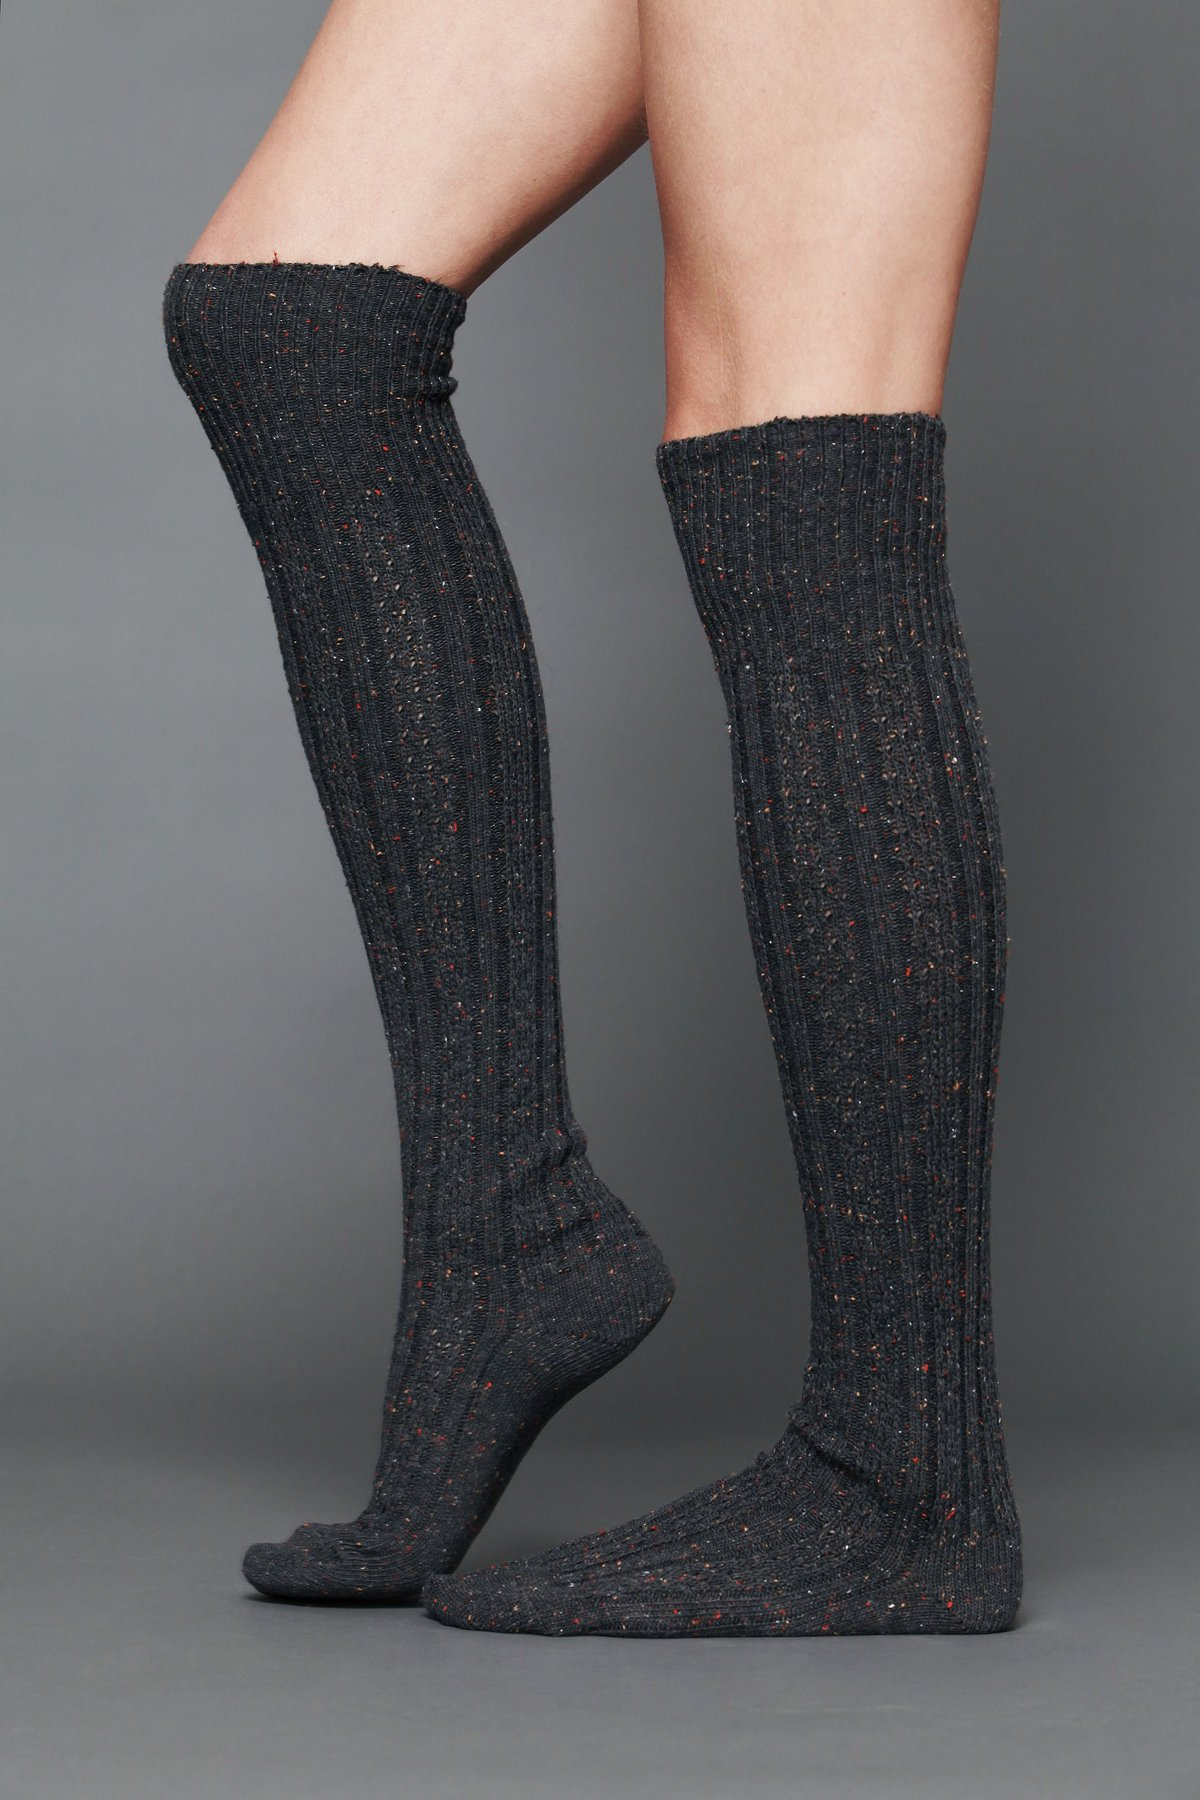 Speckled Spun Tall Sock